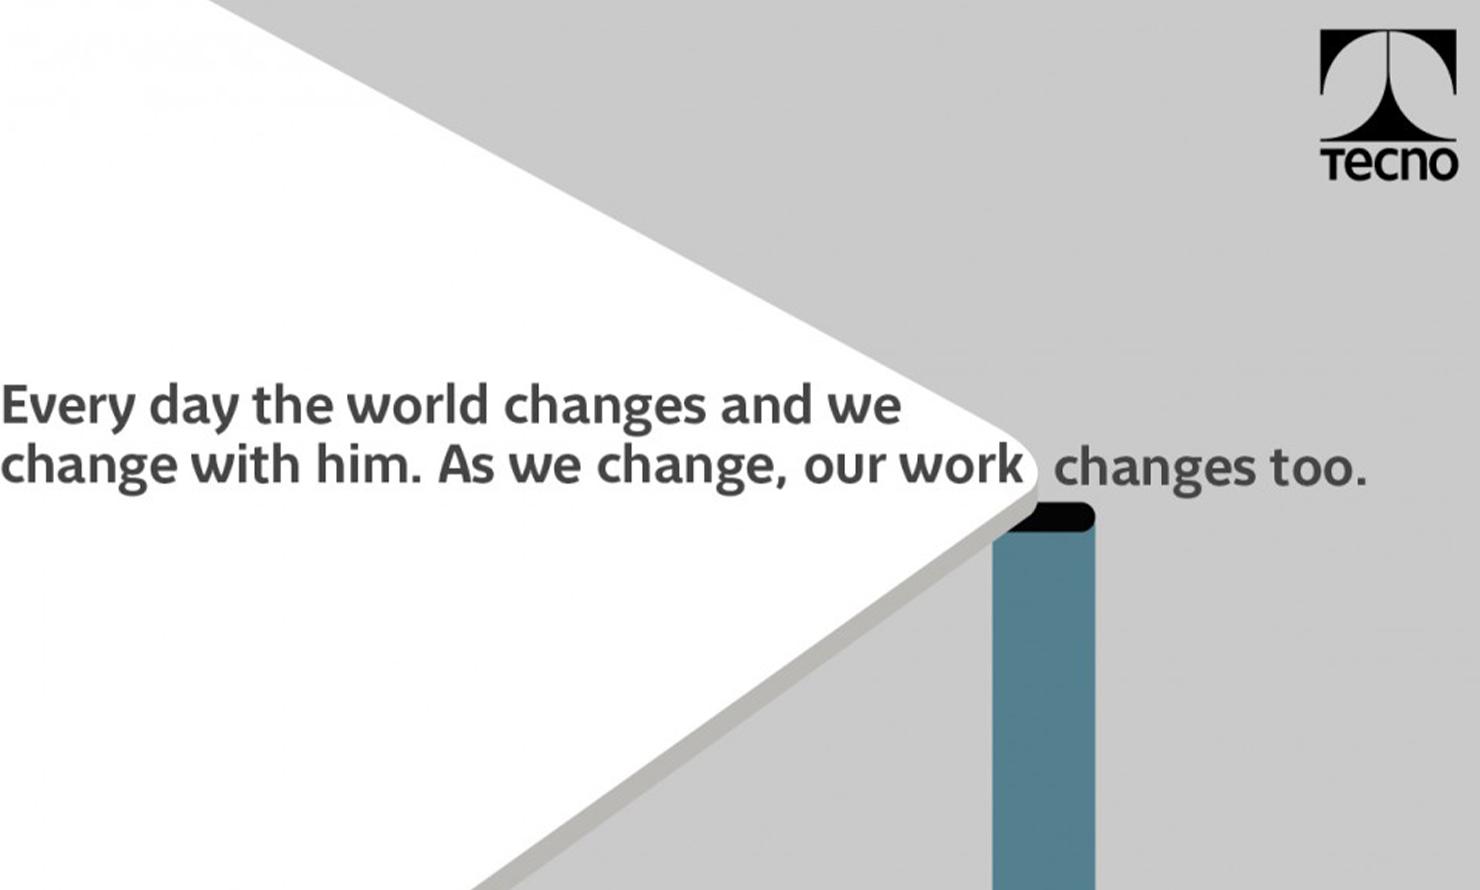 https://www.kubelibre.com/uploads/Slider-work-tutti-clienti/tecno-redesigning-the-future-of-the-future-of-work-1.jpg